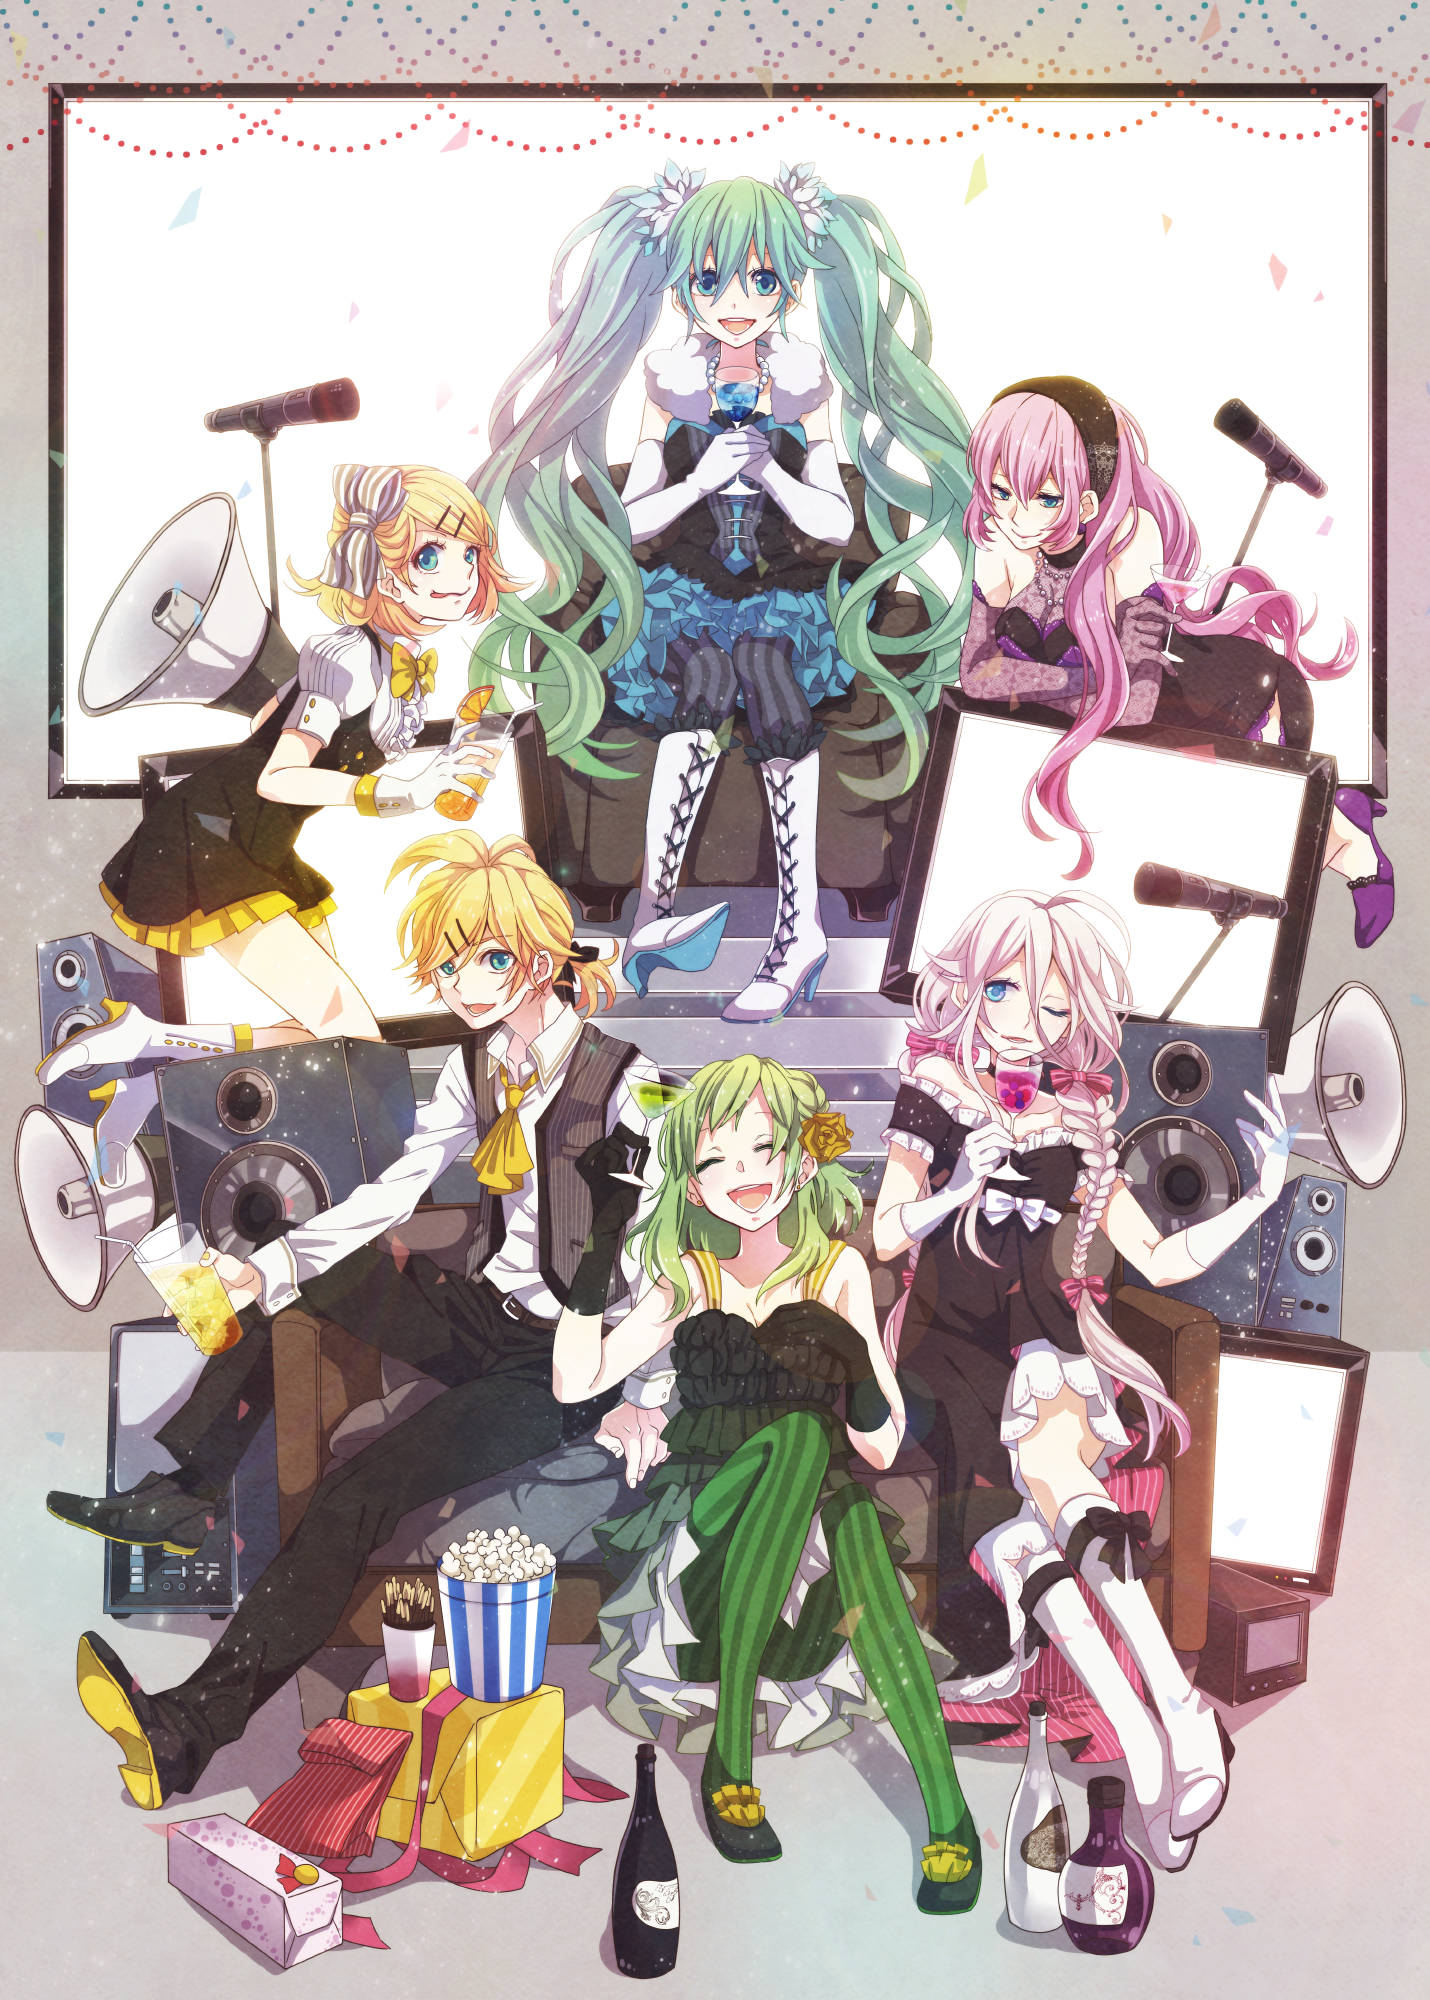 Vocaloid - Hatsune Miku, Megurine Luka, Gumi, IA, Kagamine Len and Rin, by ヤマコ on pixiv